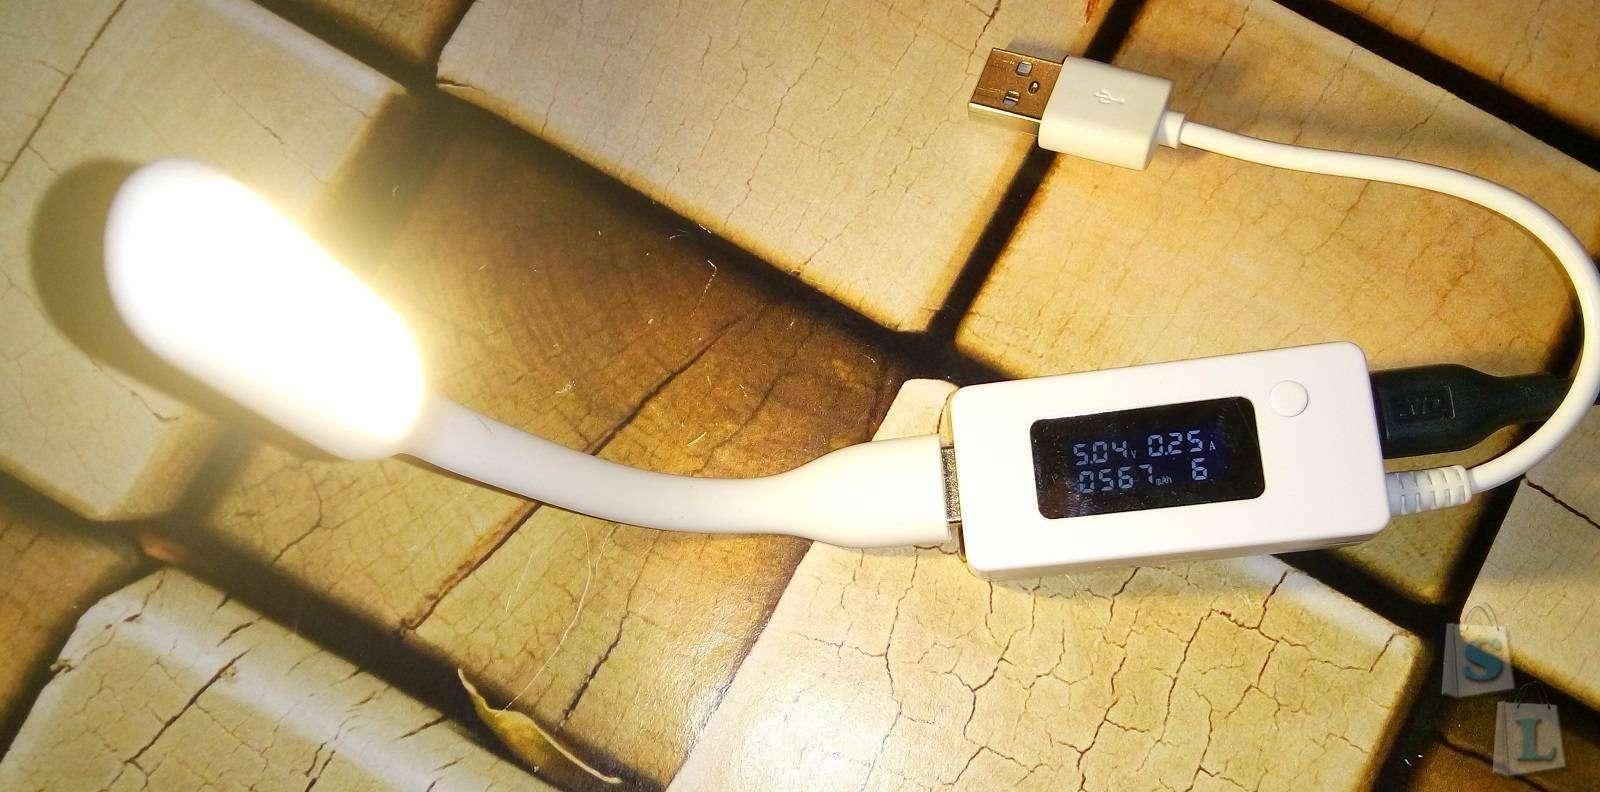 GearBest: Светодиодная лампочка Xiaomi Utility LED Light Portable USB